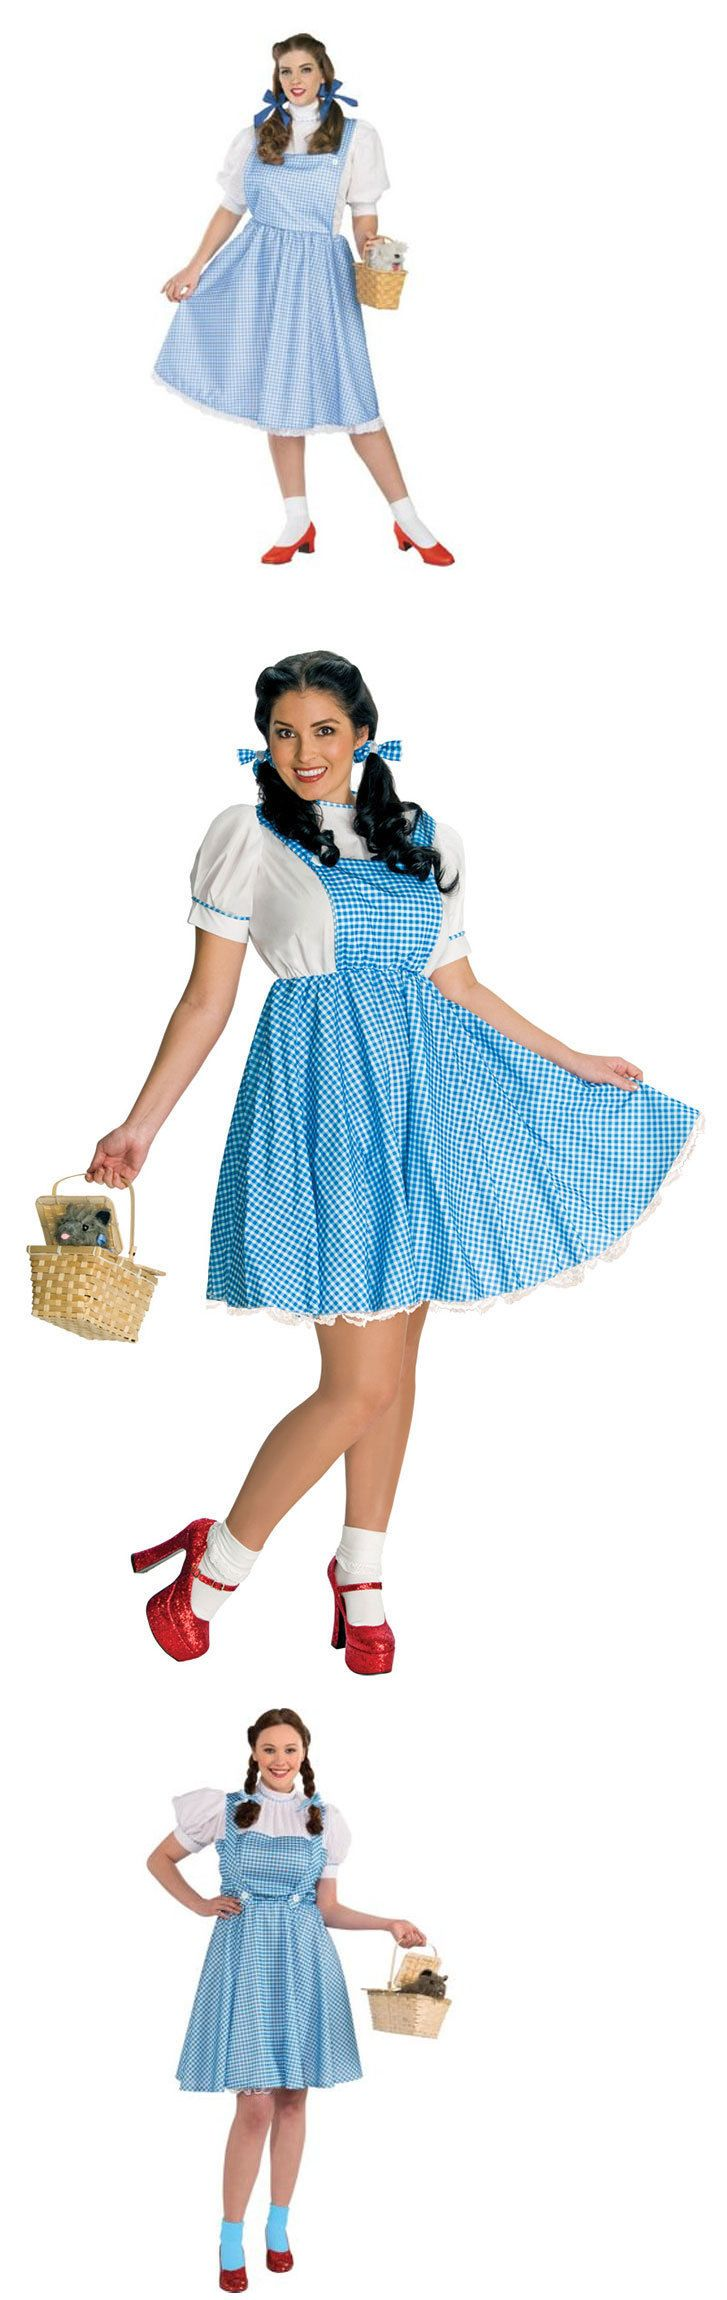 Halloween Costumes Women: Dorothy Wizard Of Oz Adult Dress Halloween Costume Xl (14-16) -> BUY IT NOW ONLY: $49 on eBay!